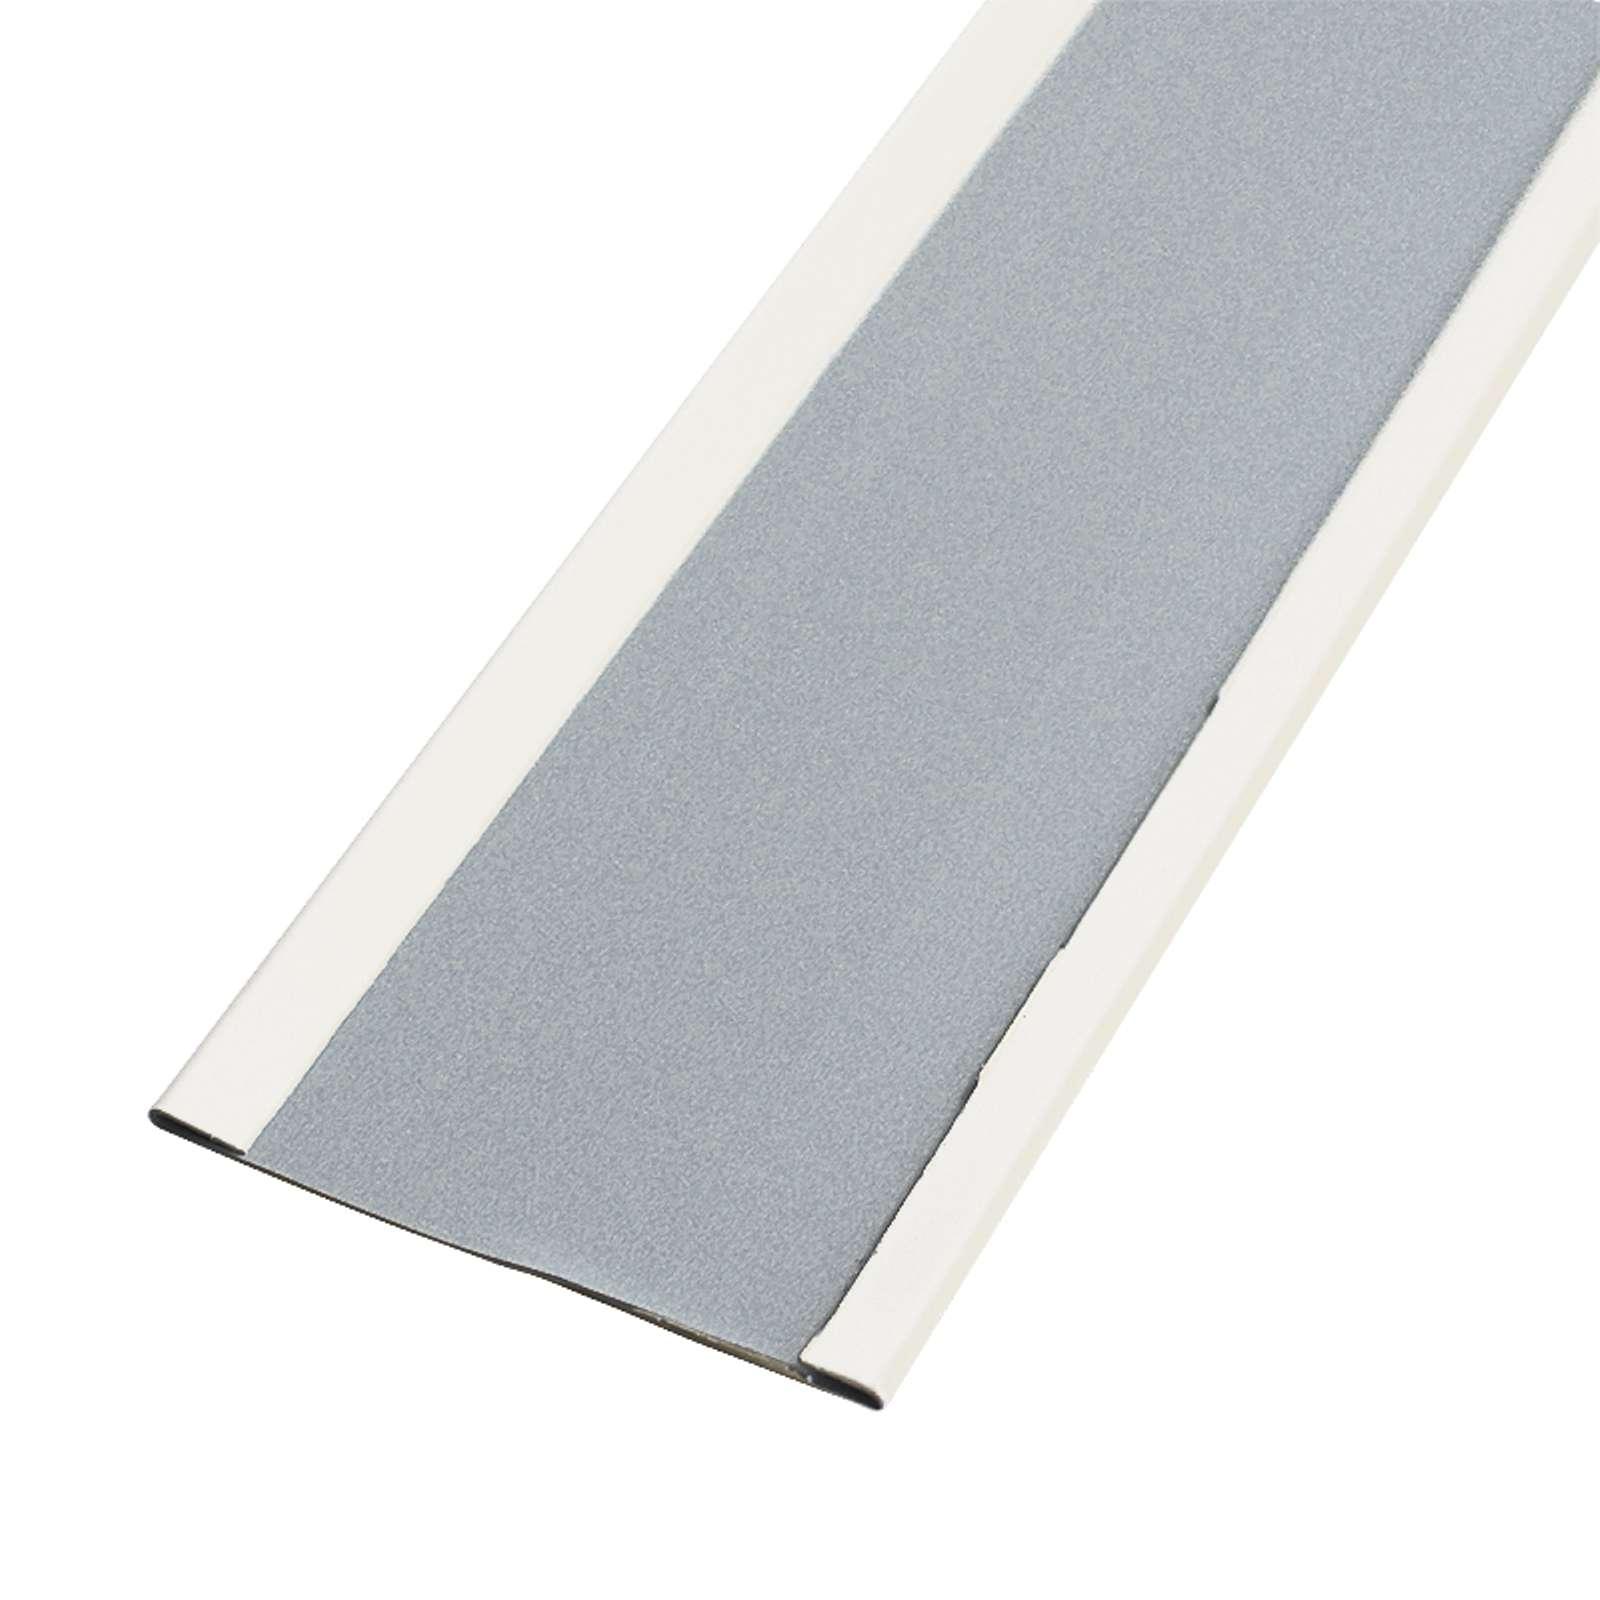 Планка стыковочн. метал. (белый RAL 9003) 60х3000